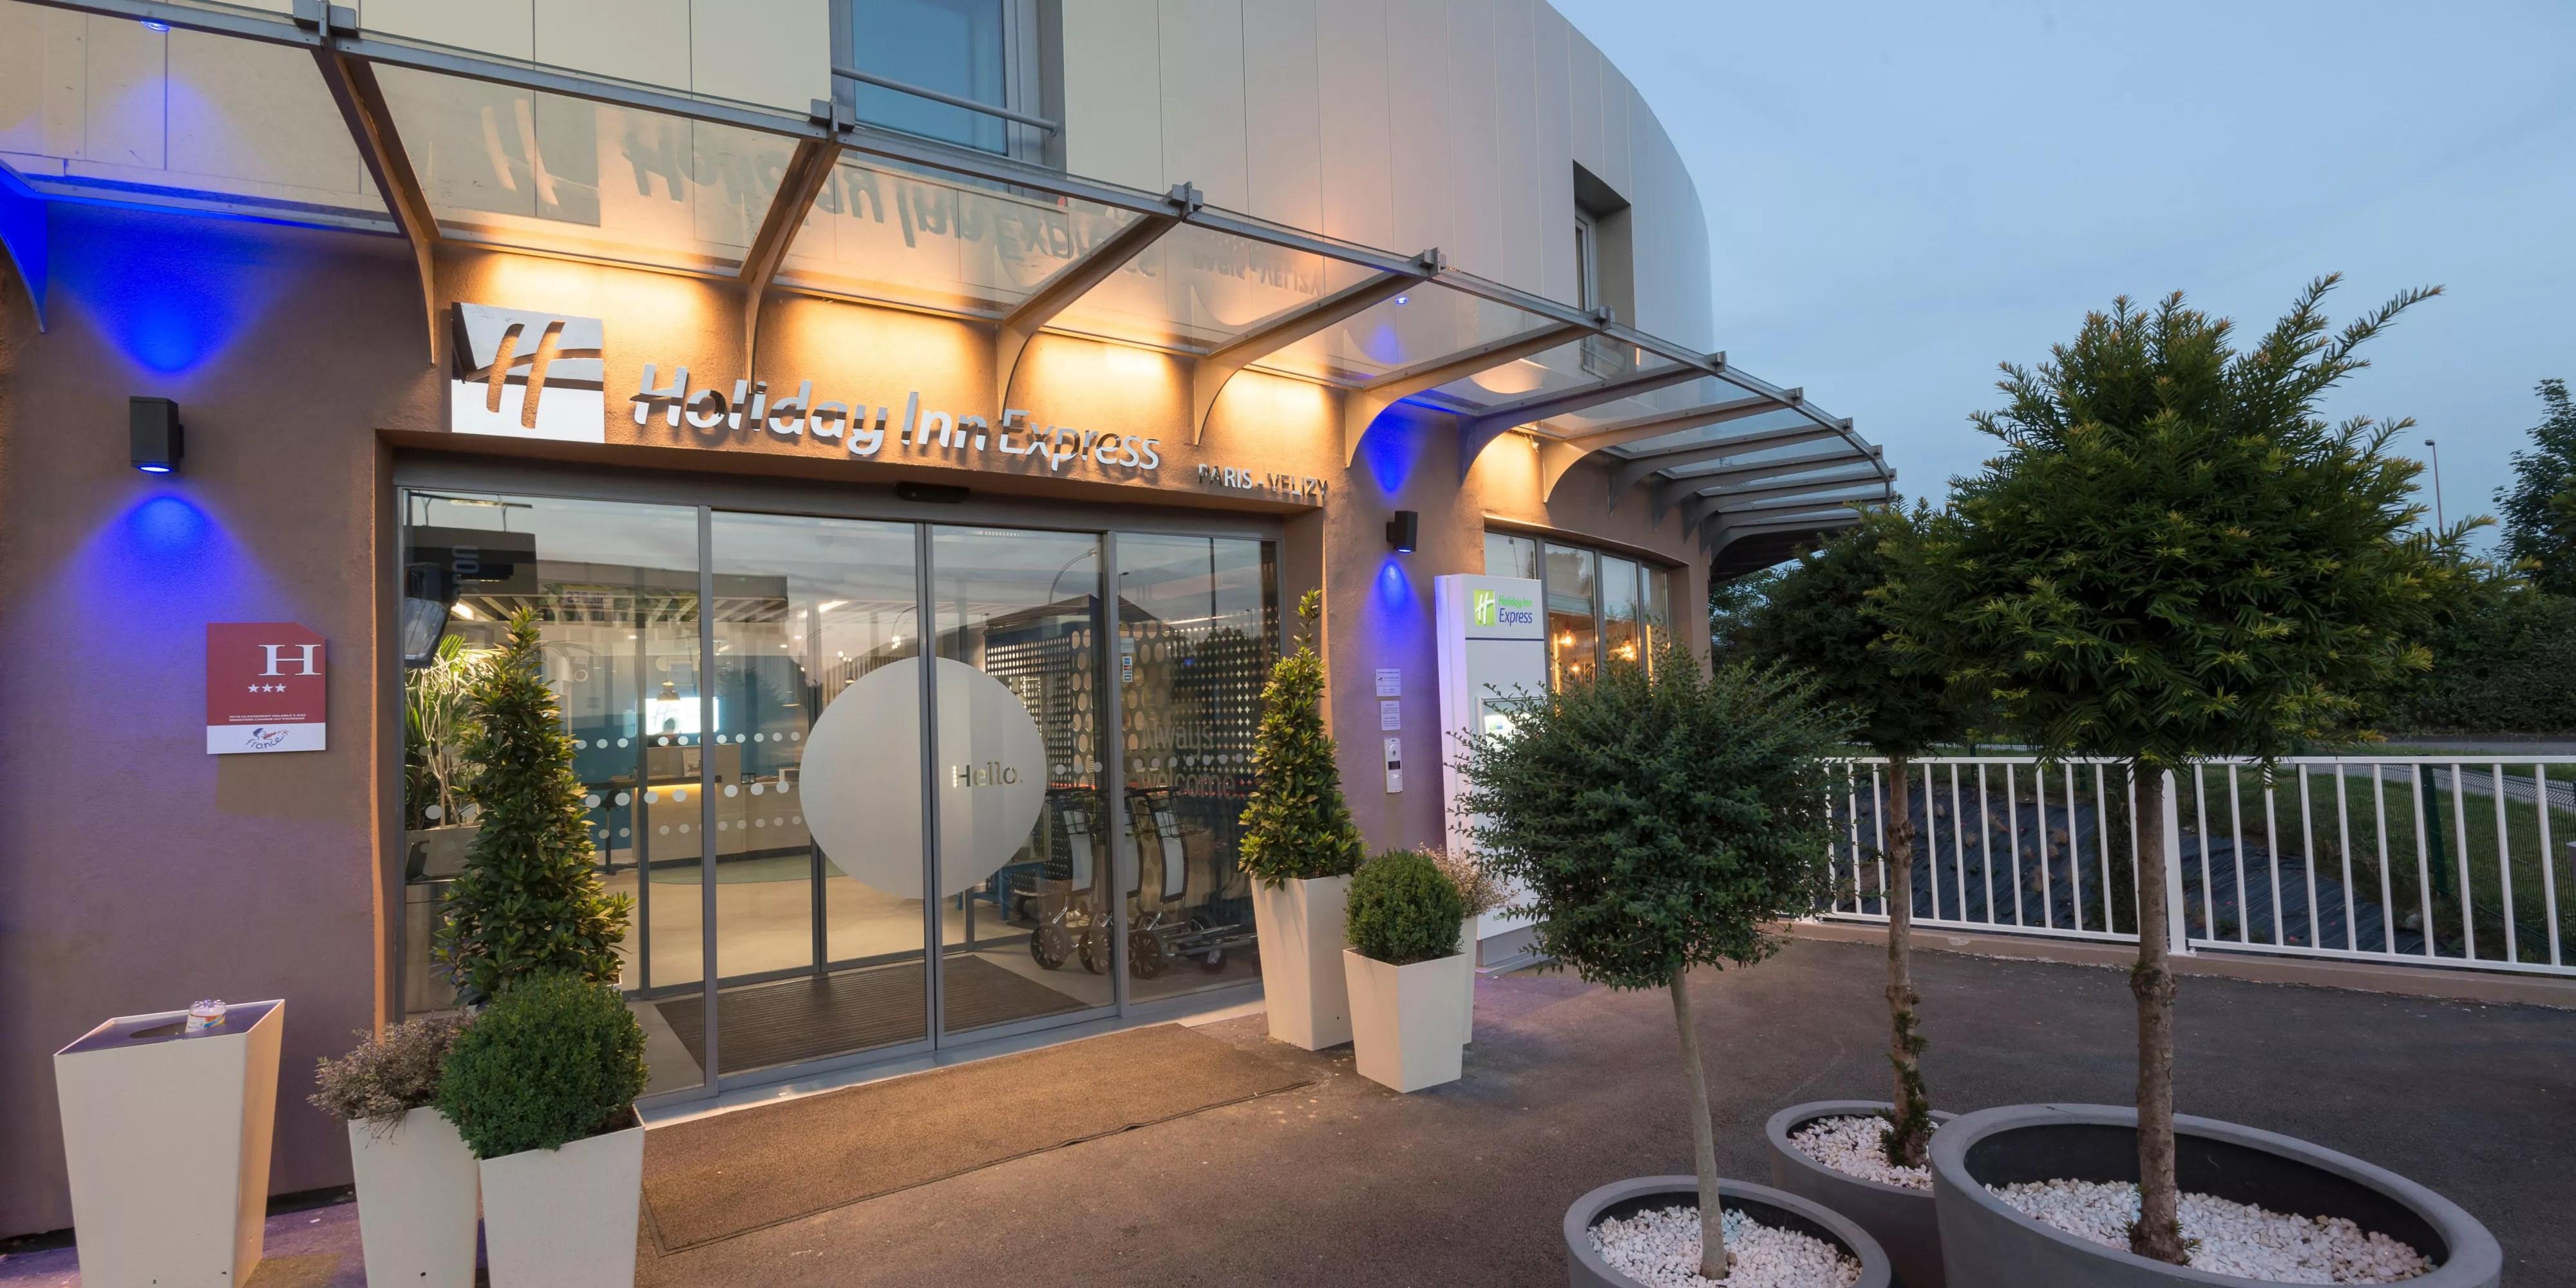 holiday inn express paris velizy